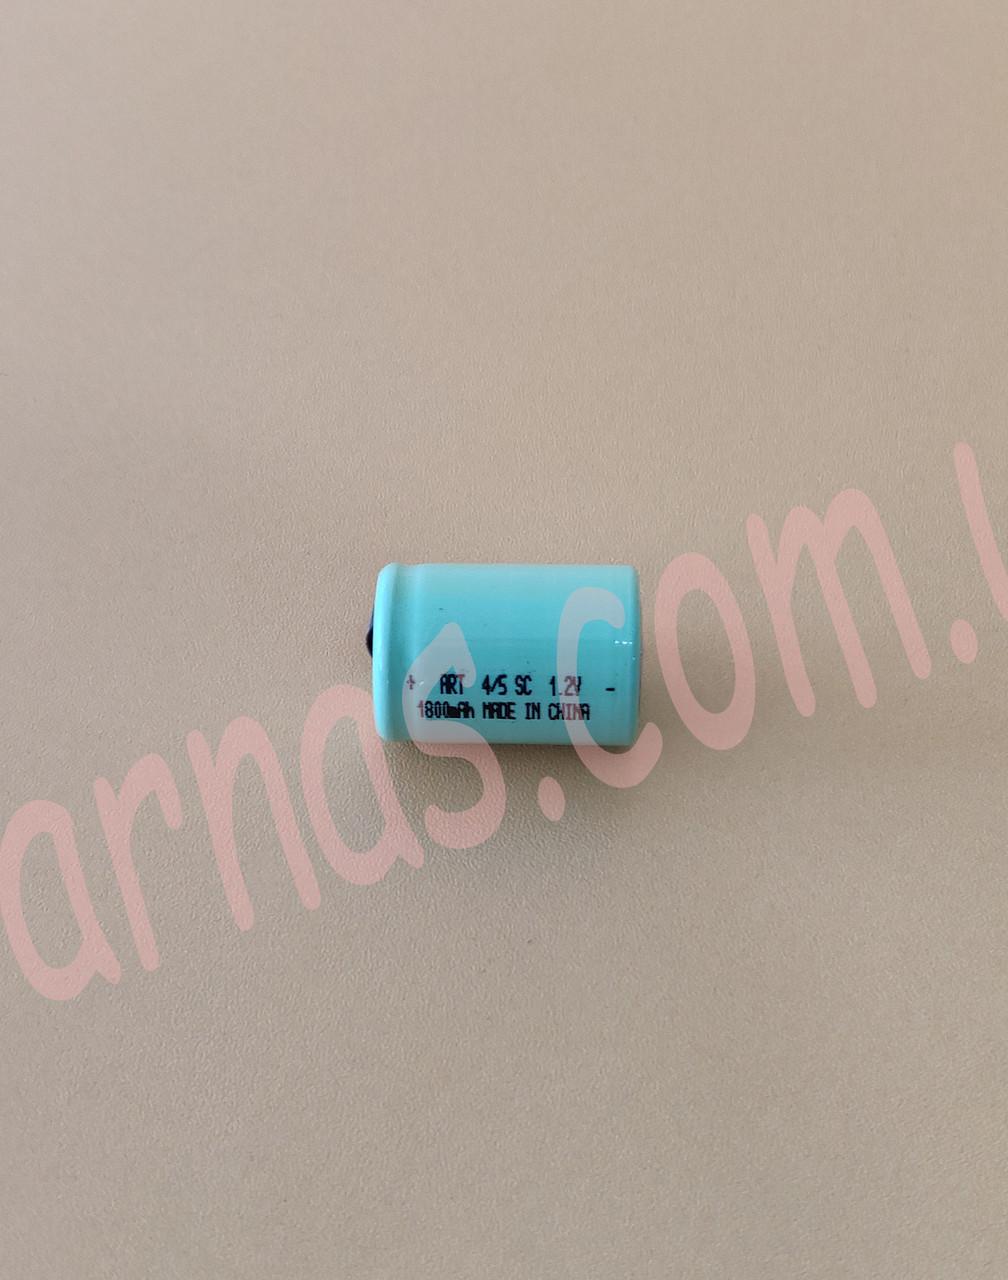 Аккумулятор ART 4/5SC 1.2v 1800 mAh